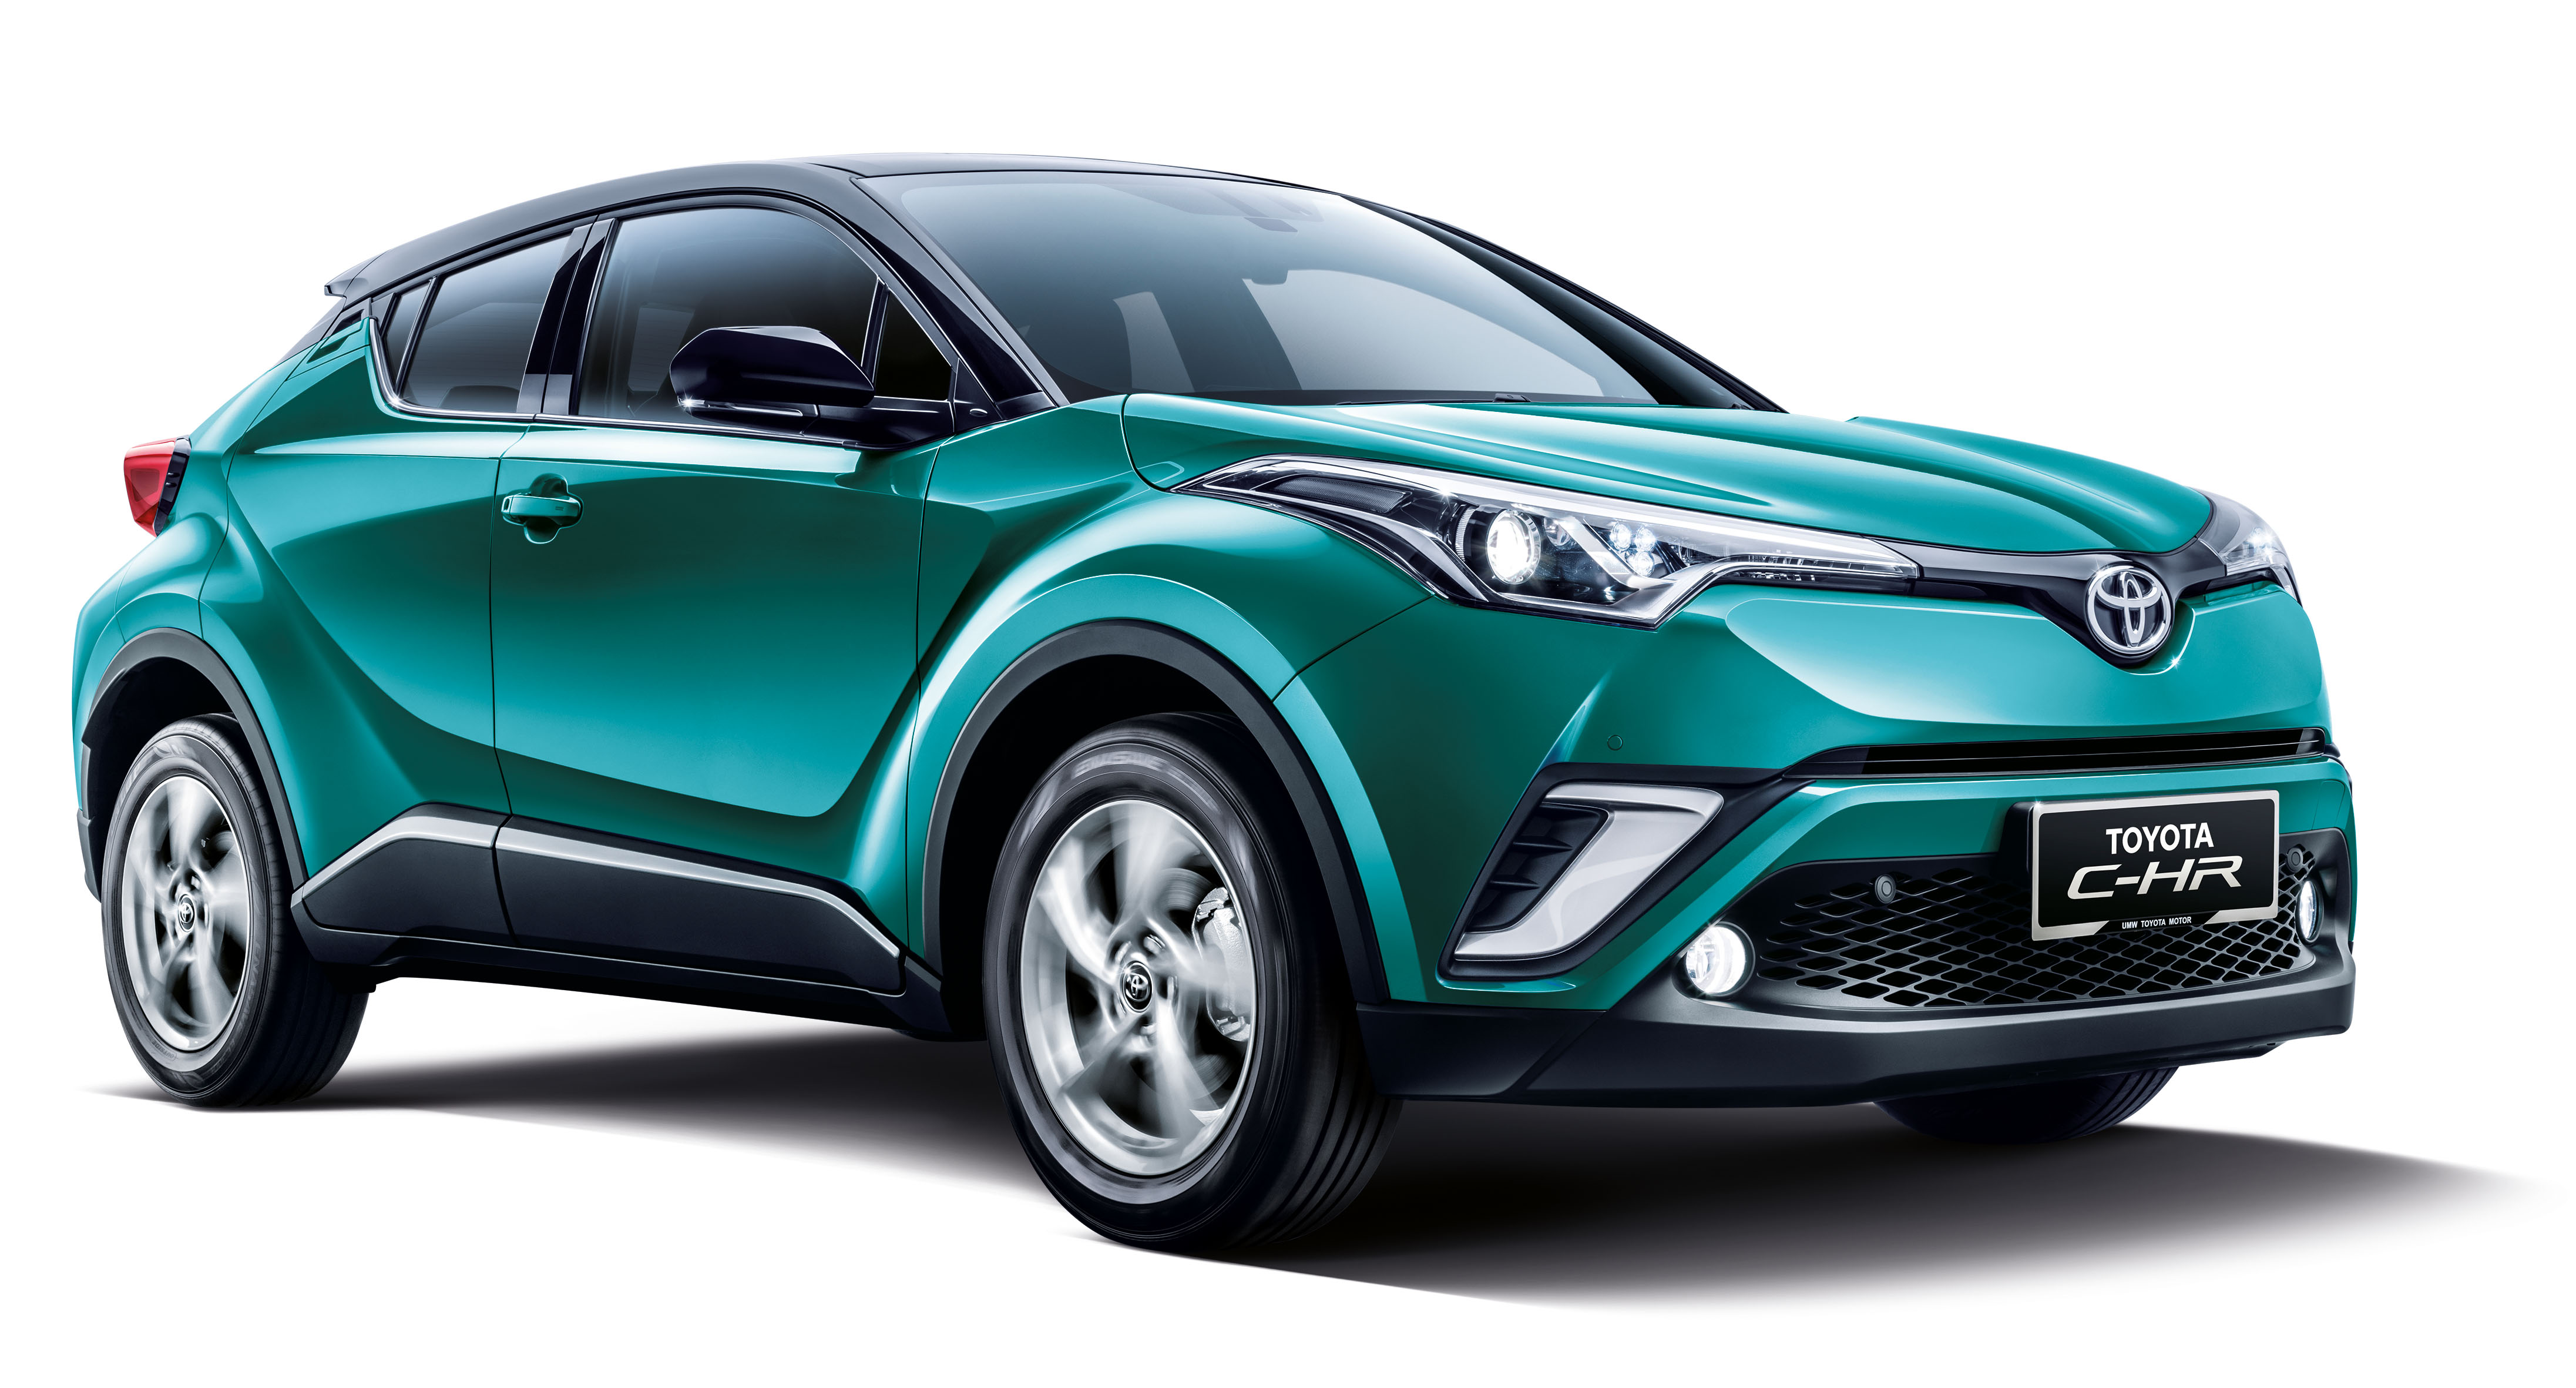 Kekurangan Toyota Chr 2019 Harga